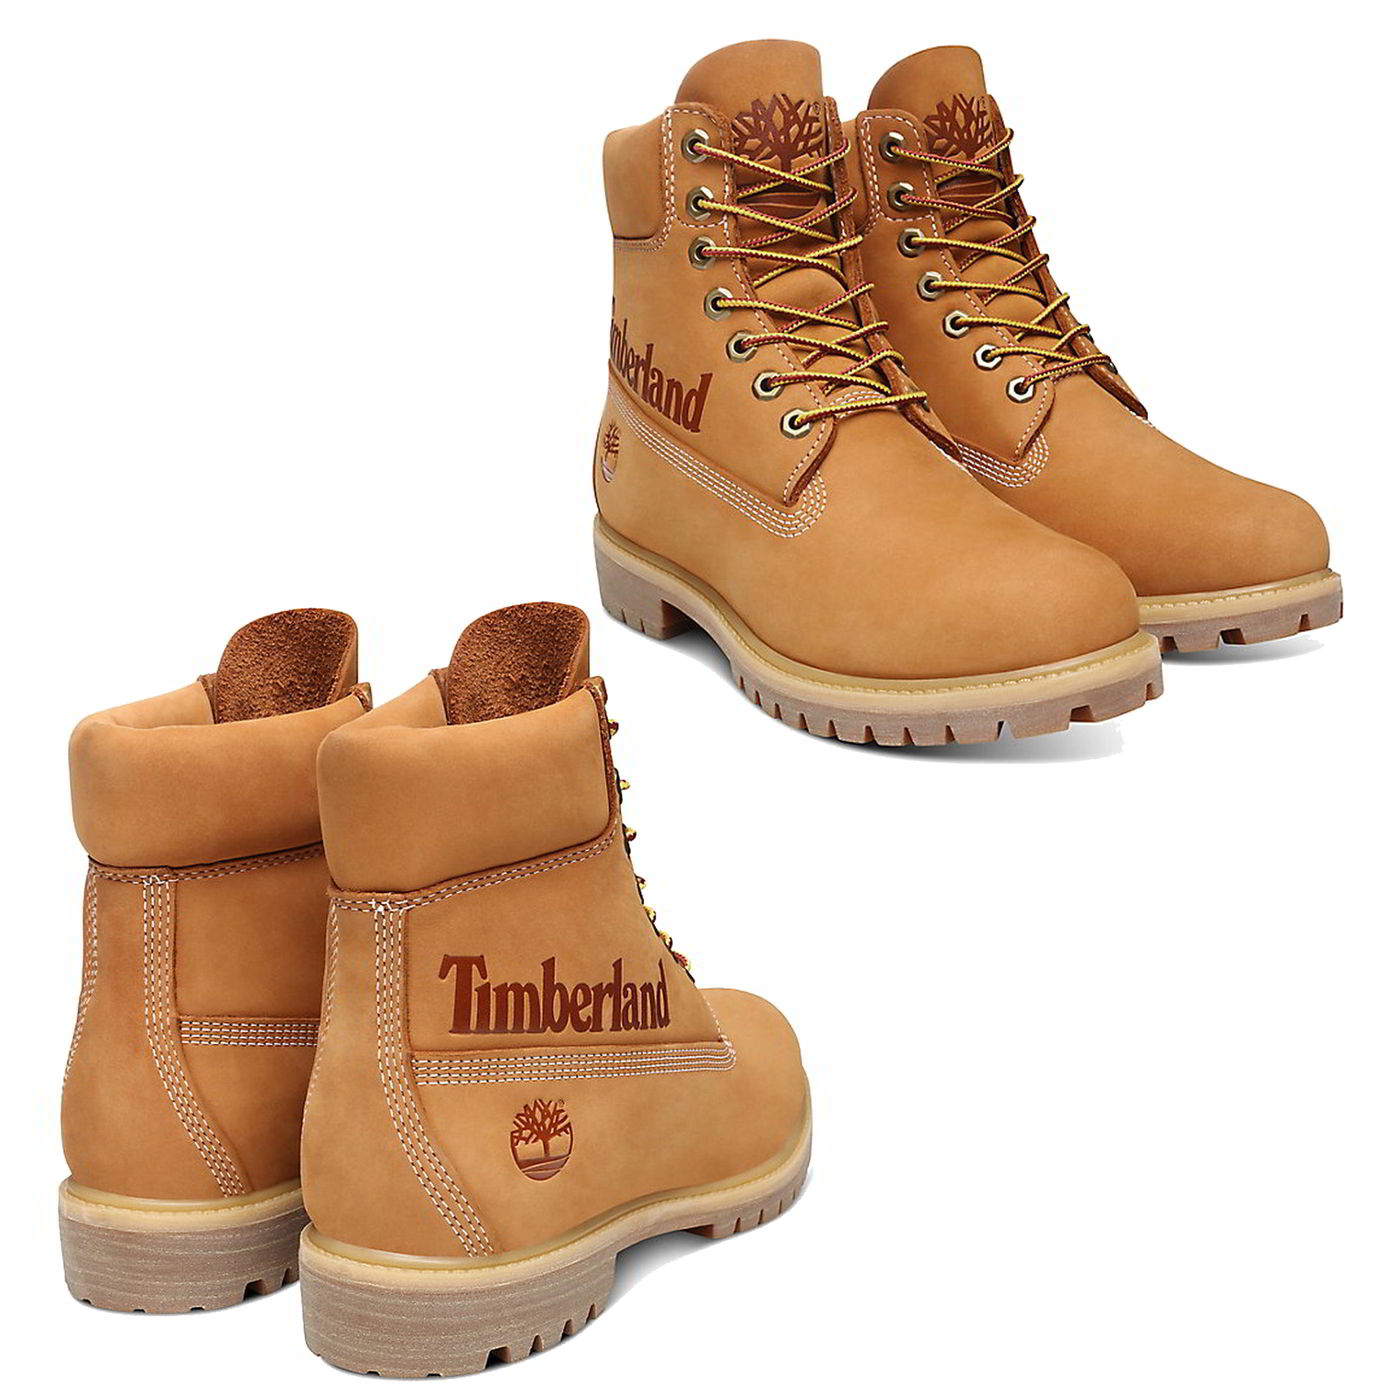 Timberland Mens 6 Inch Classic Yellow Premium Ltd Edtion Waterproof ... a12a4ef36db